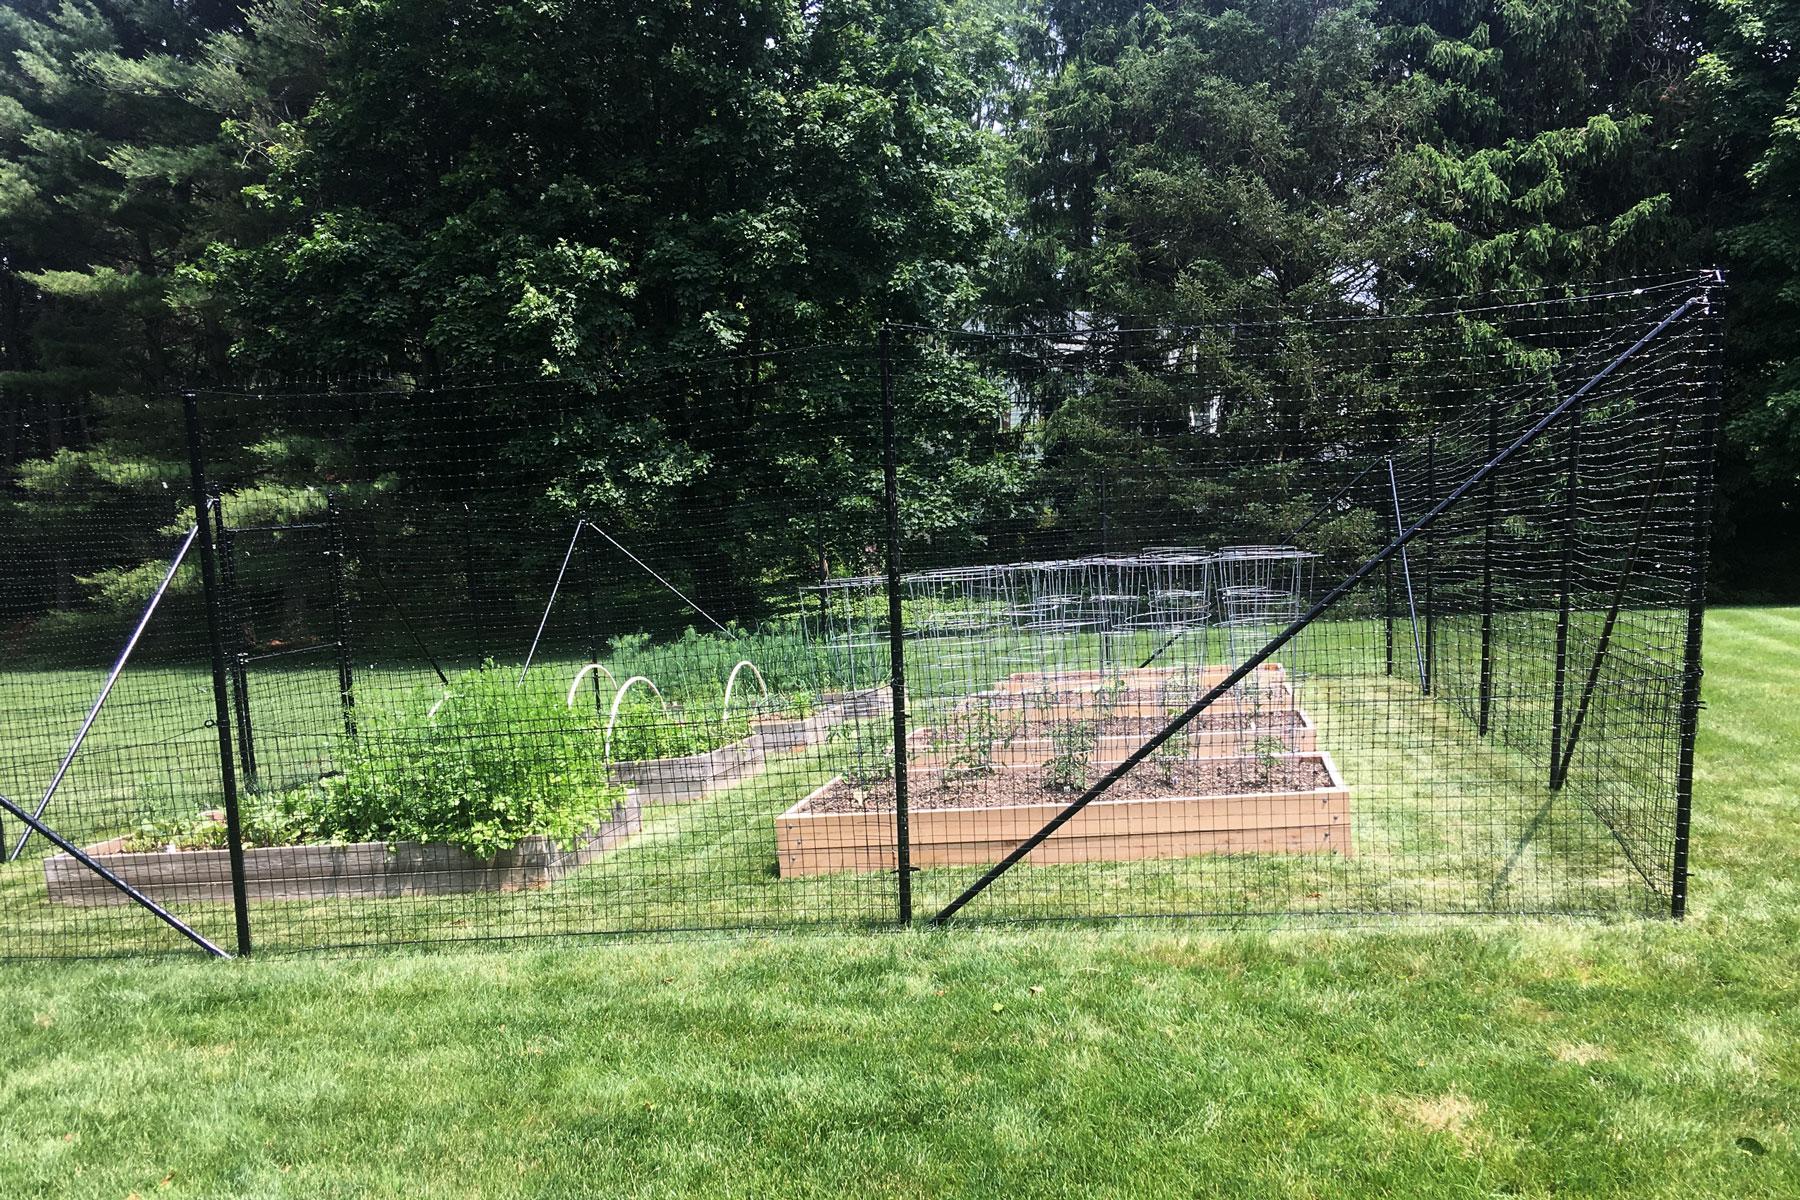 Garden Fence The Benner Deer Fence Company